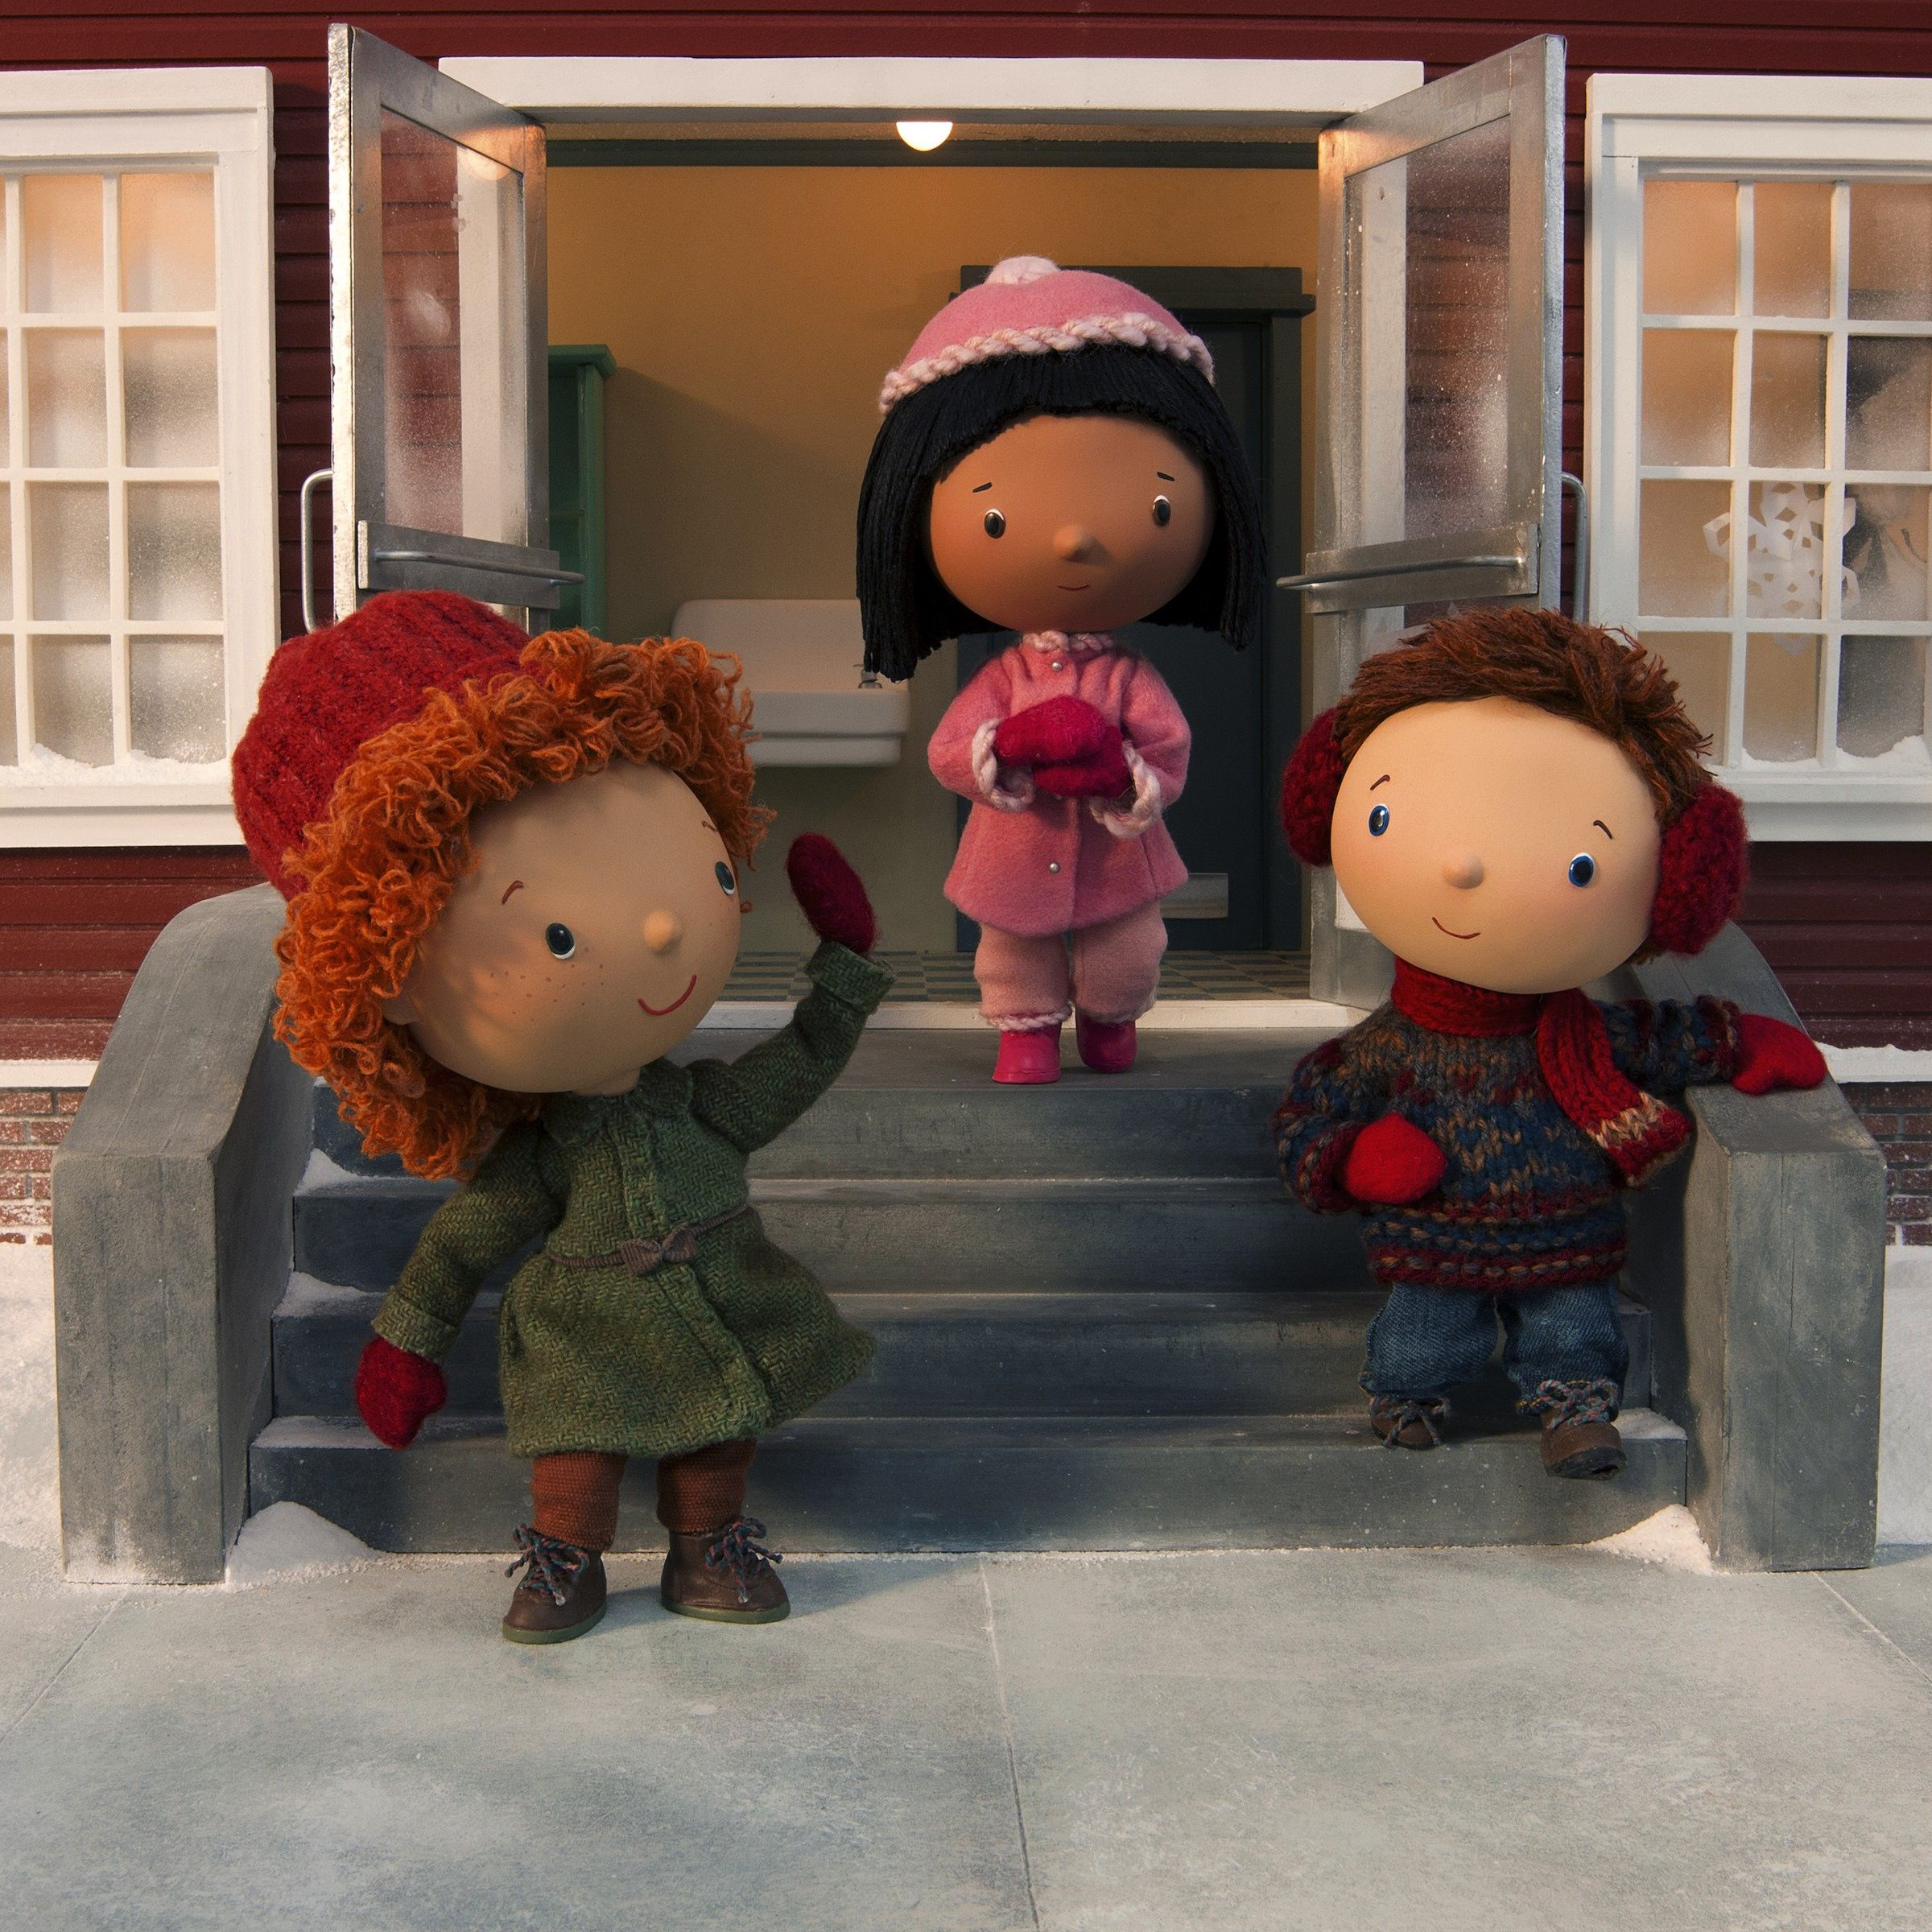 Jingle and Bell's Christmas Star Hallmark Channel Original